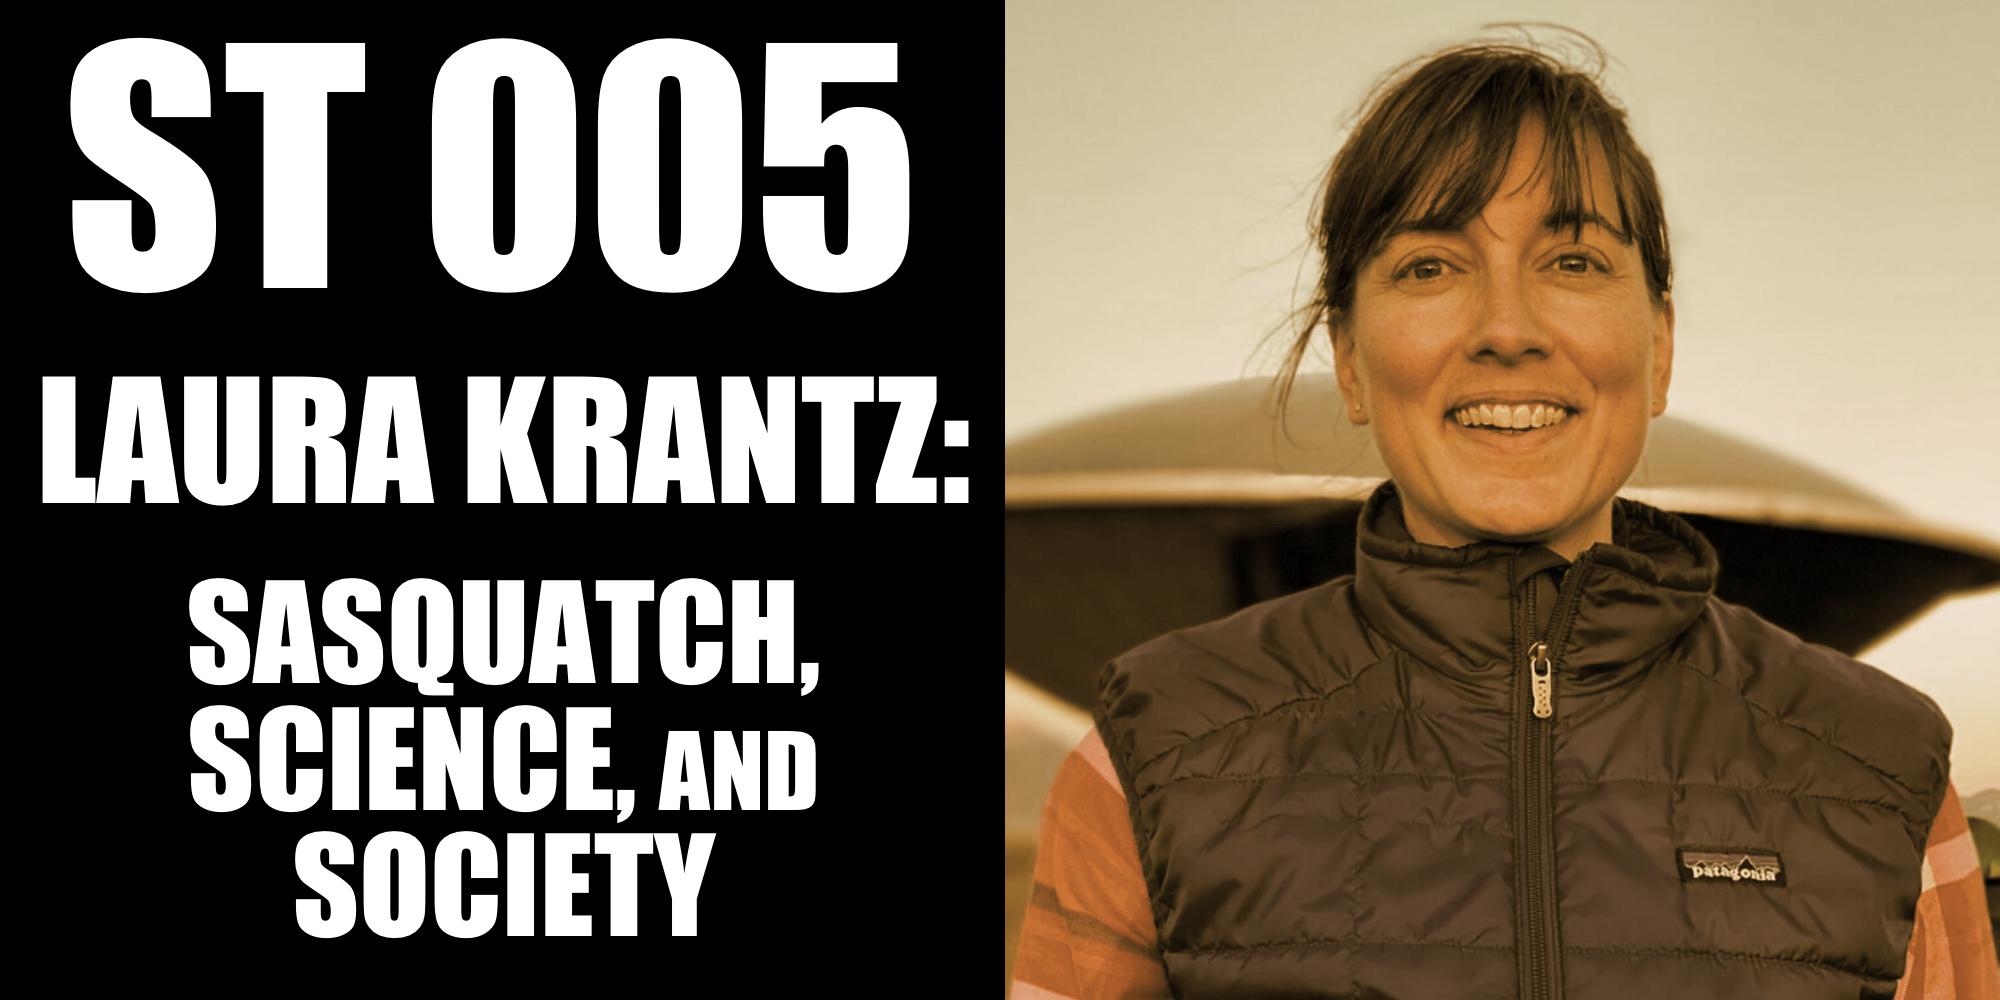 Laura Krantz